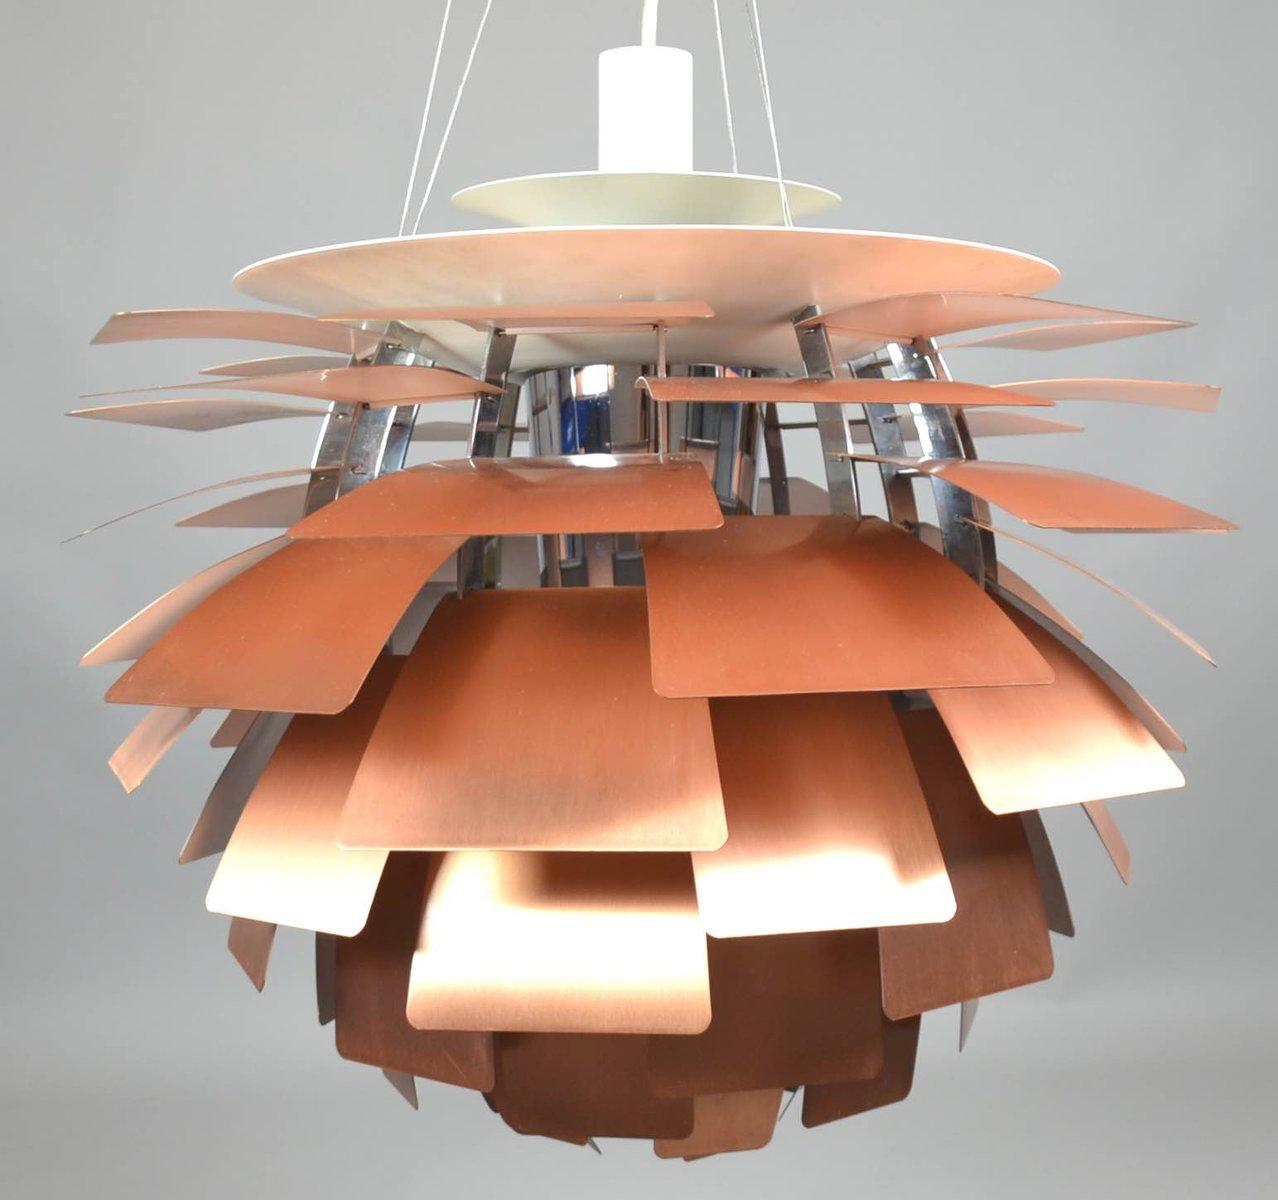 Mid century ph artichoke copper lamp by poul henningsen for louis mid century ph artichoke copper lamp by poul henningsen for louis poulsen aloadofball Choice Image